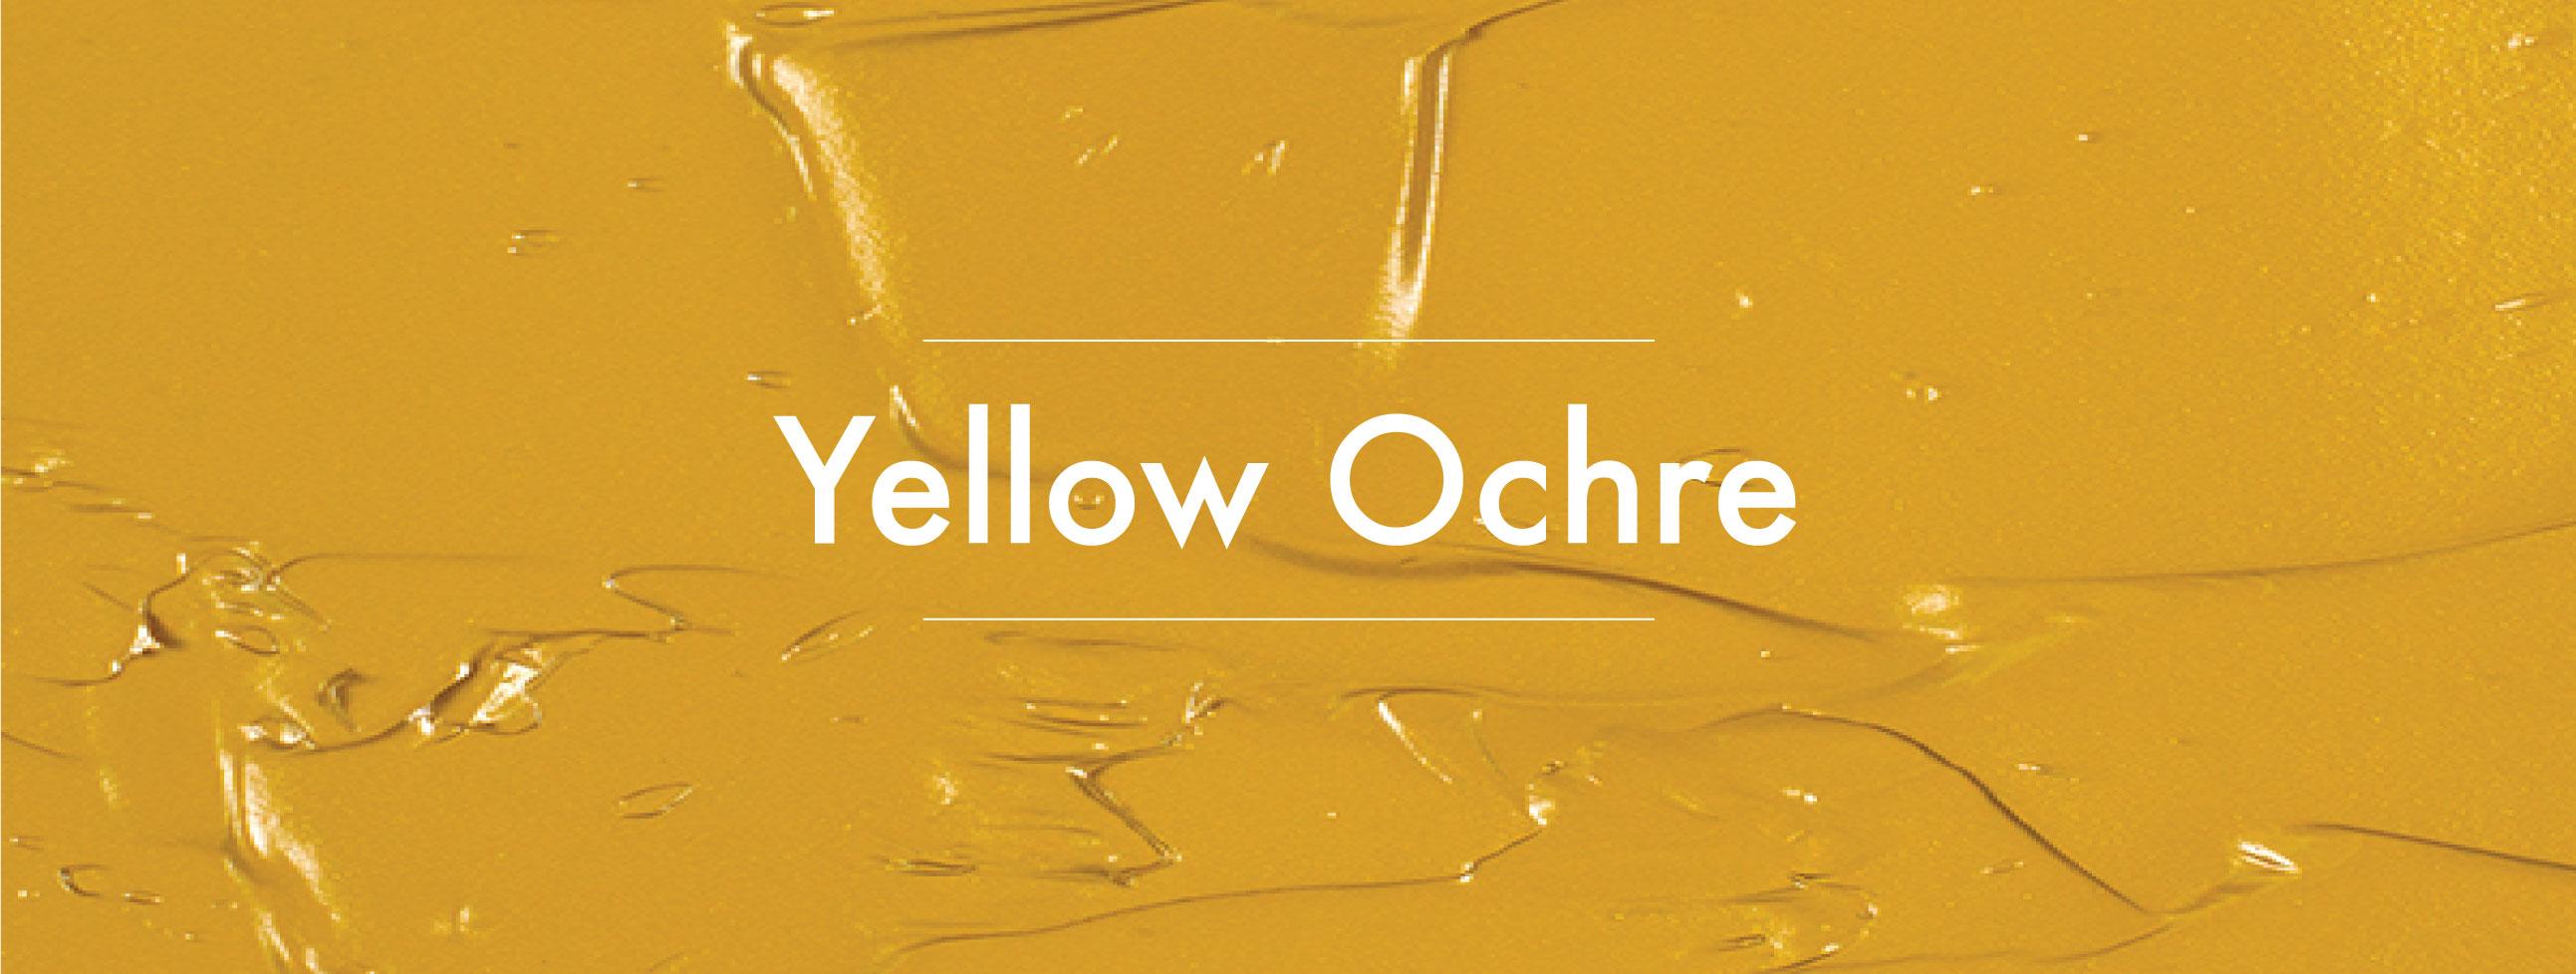 banner-yellow.jpg